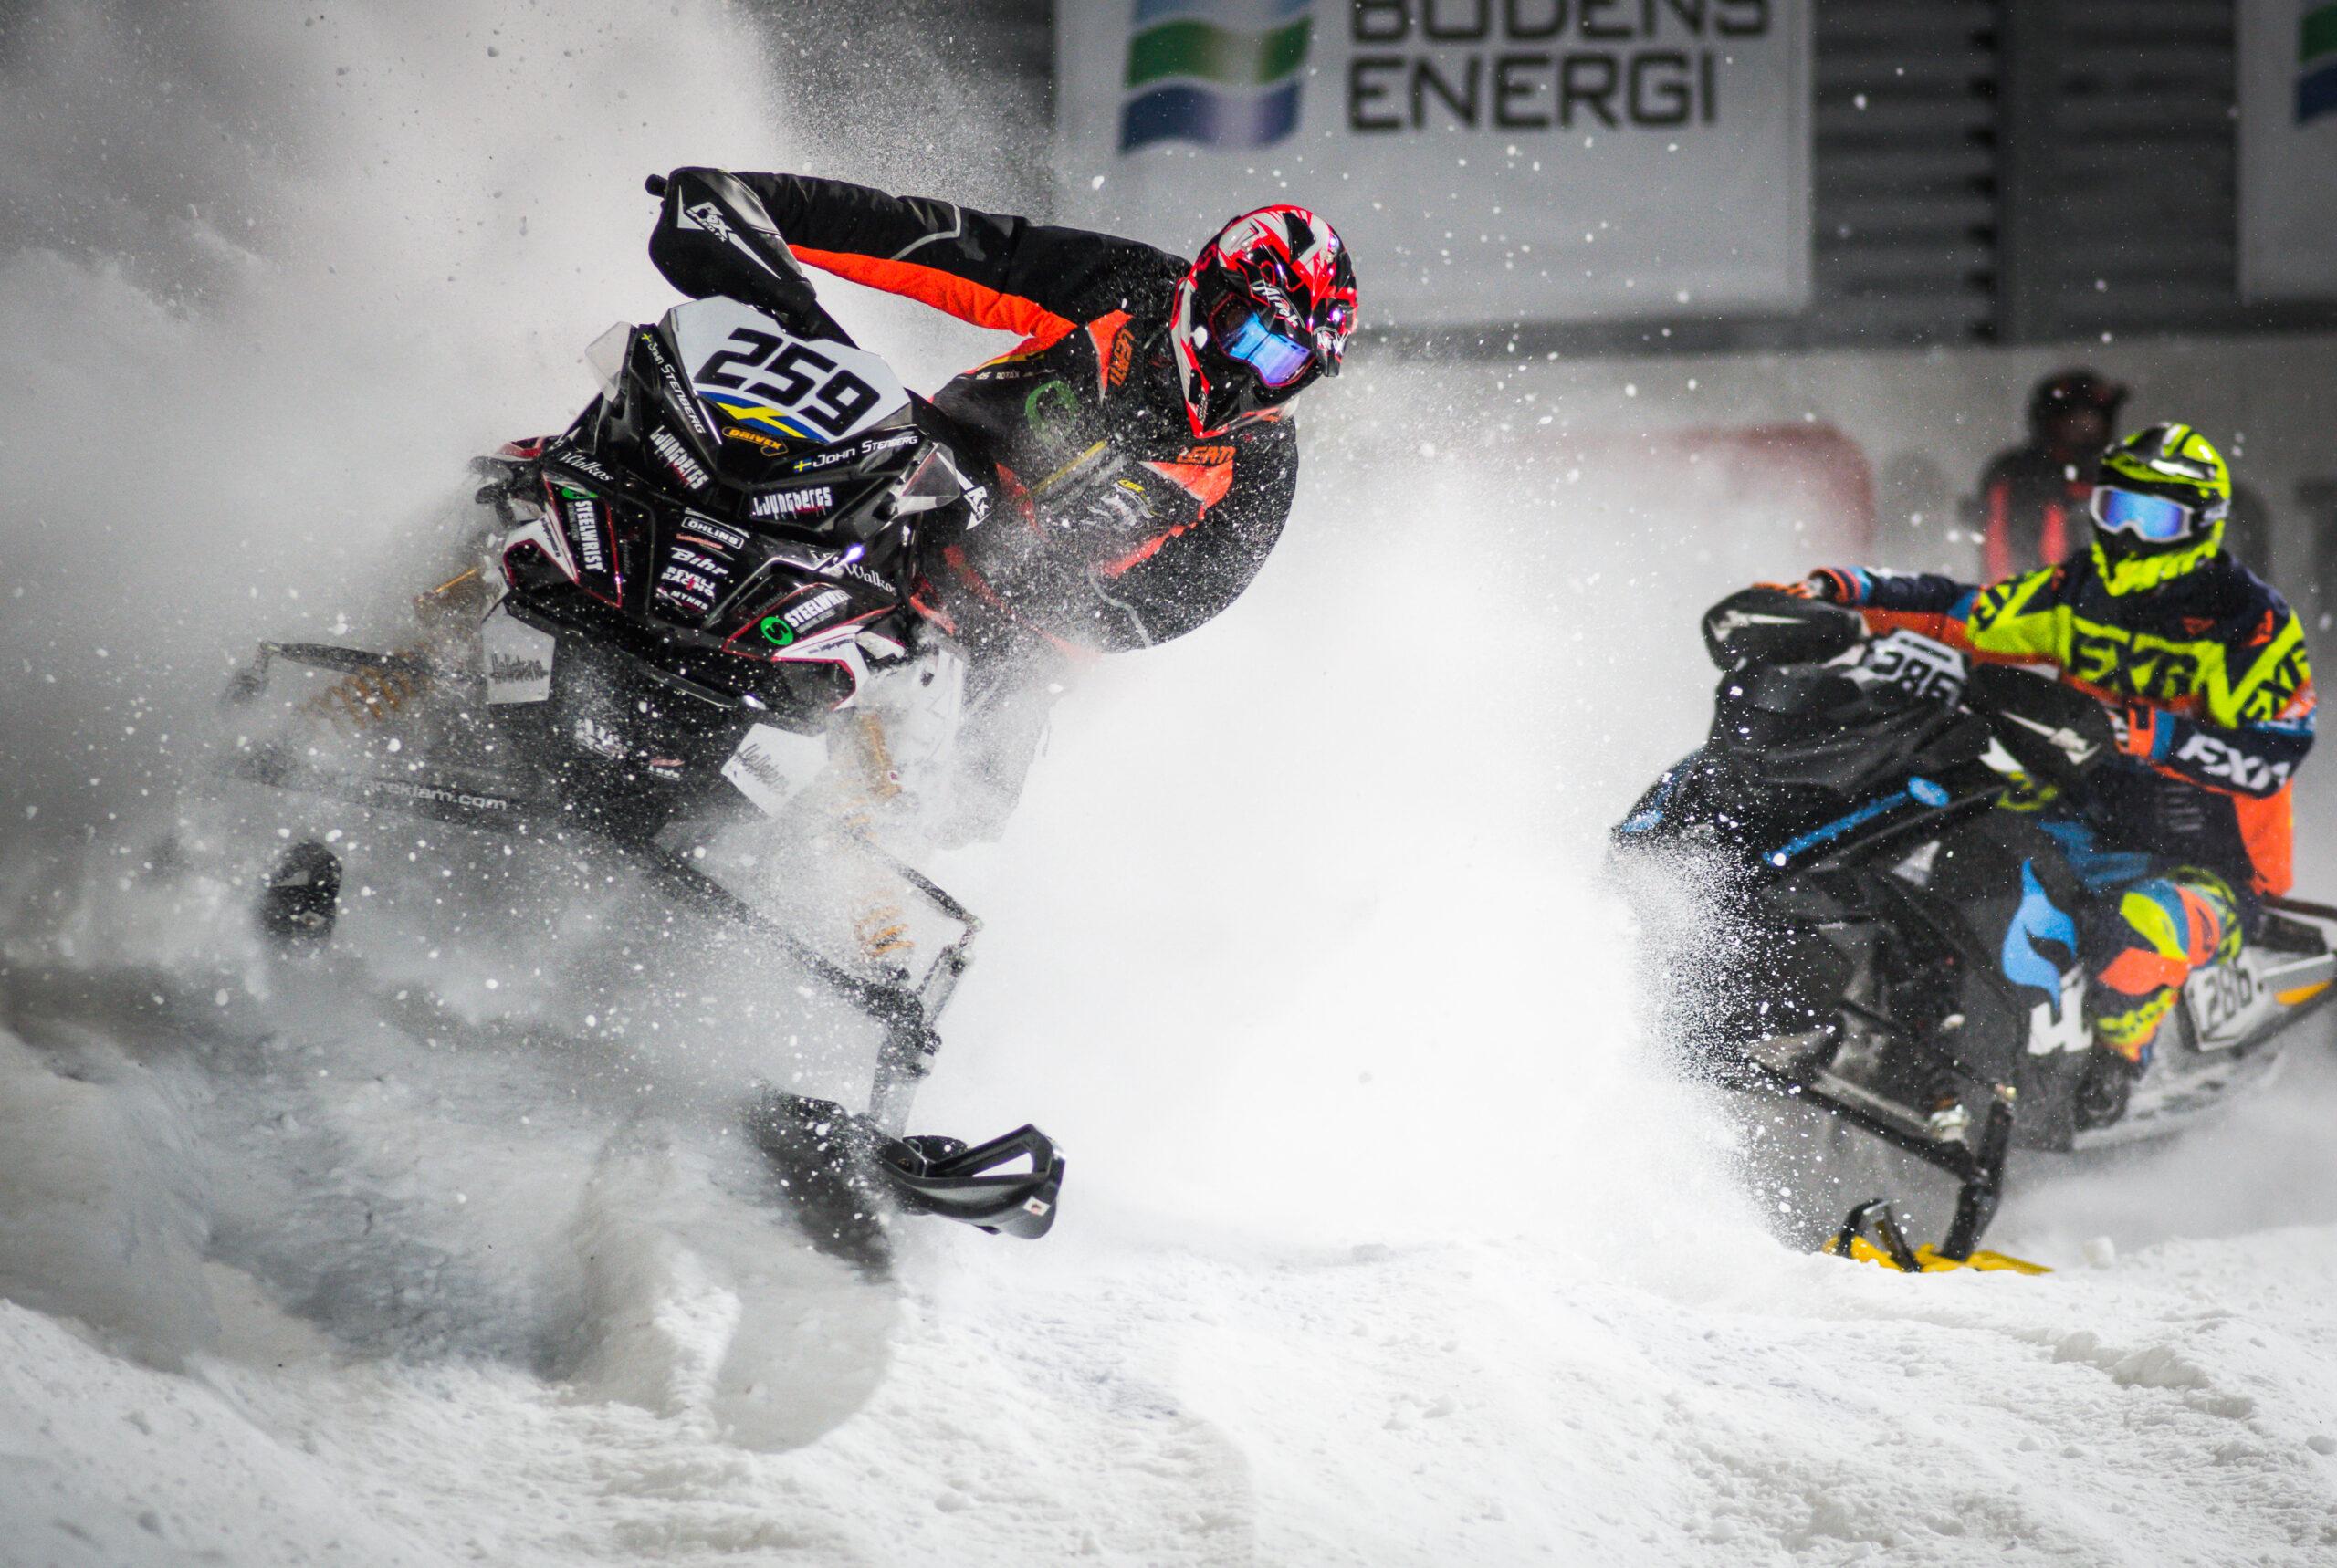 Super-X skotercross på Boden Arena. 259 John Stenberg, Lofsdalens SK, Ljungbergs Motor Racing Team.